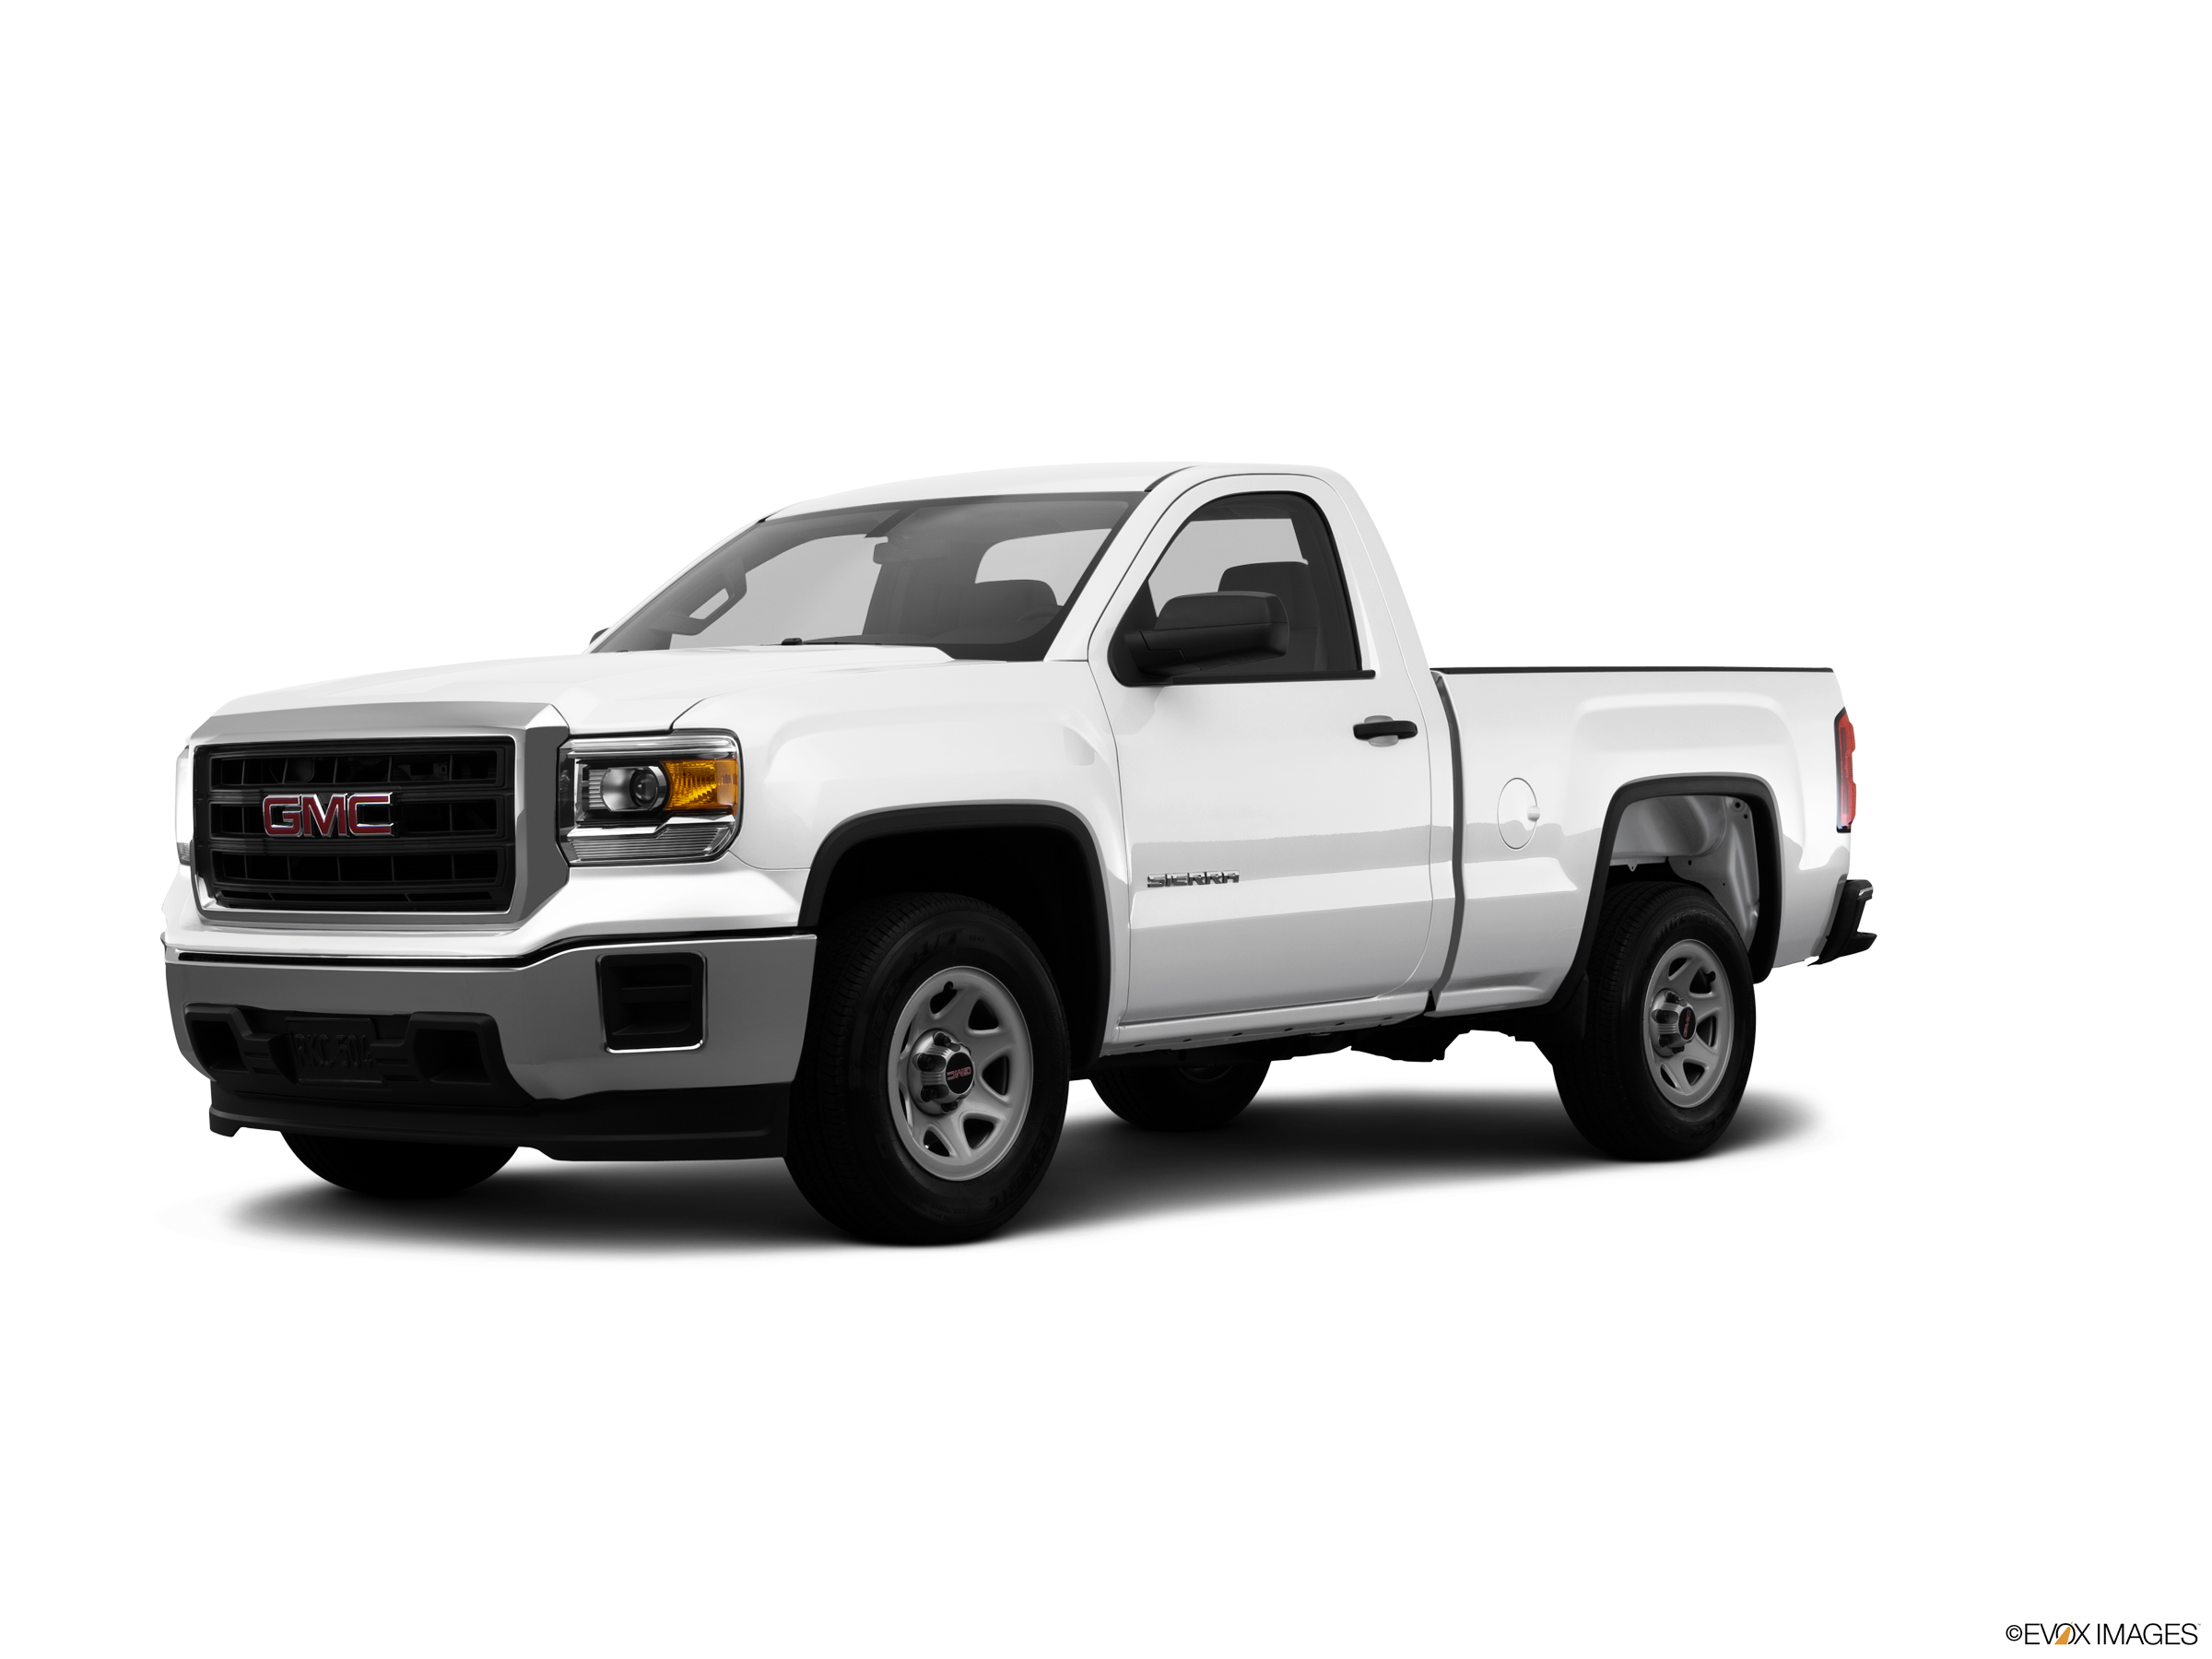 2014 Gmc Sierra 1500 Values Cars For Sale Kelley Blue Book